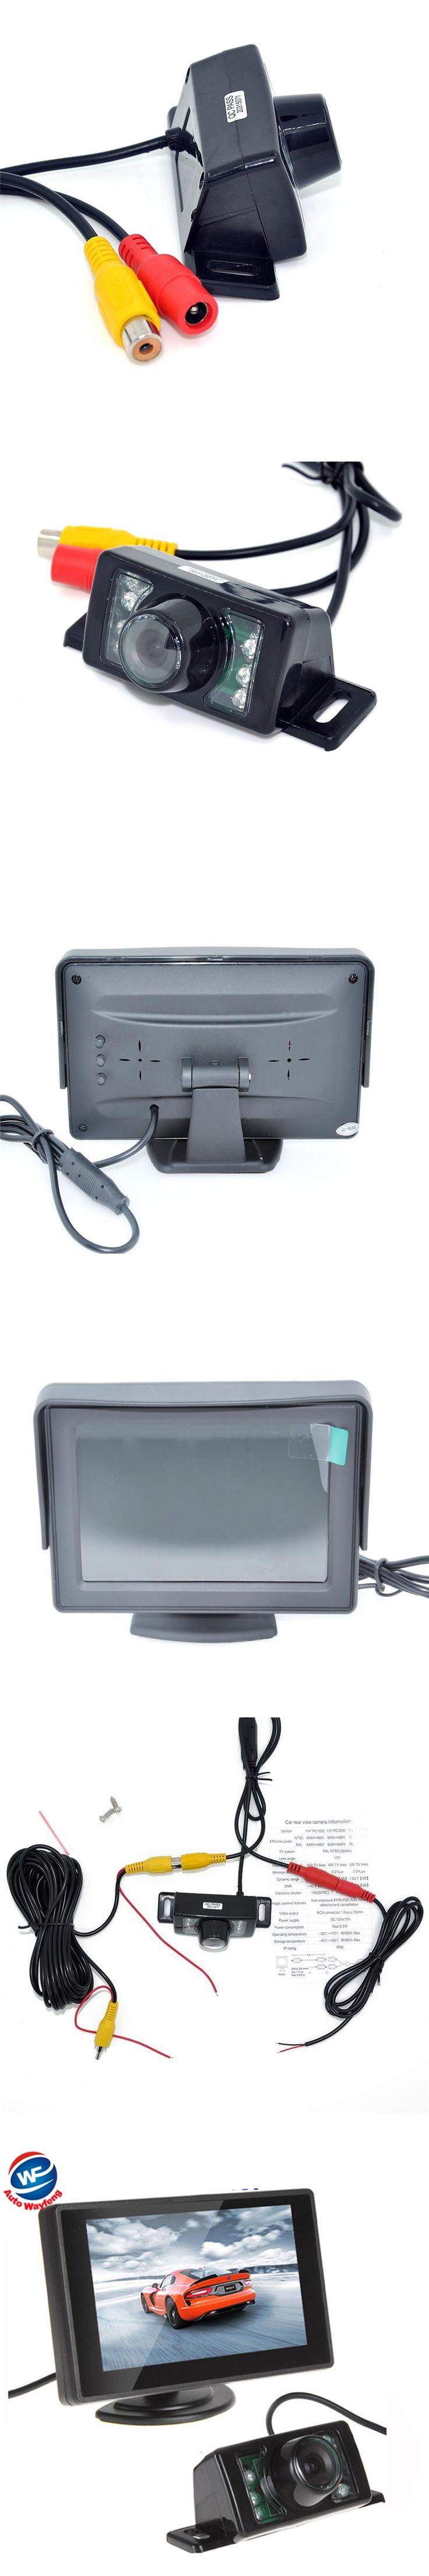 "7LED Car Rearview Camera+4.3"" TFT LCD Monitor  HD 170 Angle car backup camera Car Monitor Auto Parking Assistance System"